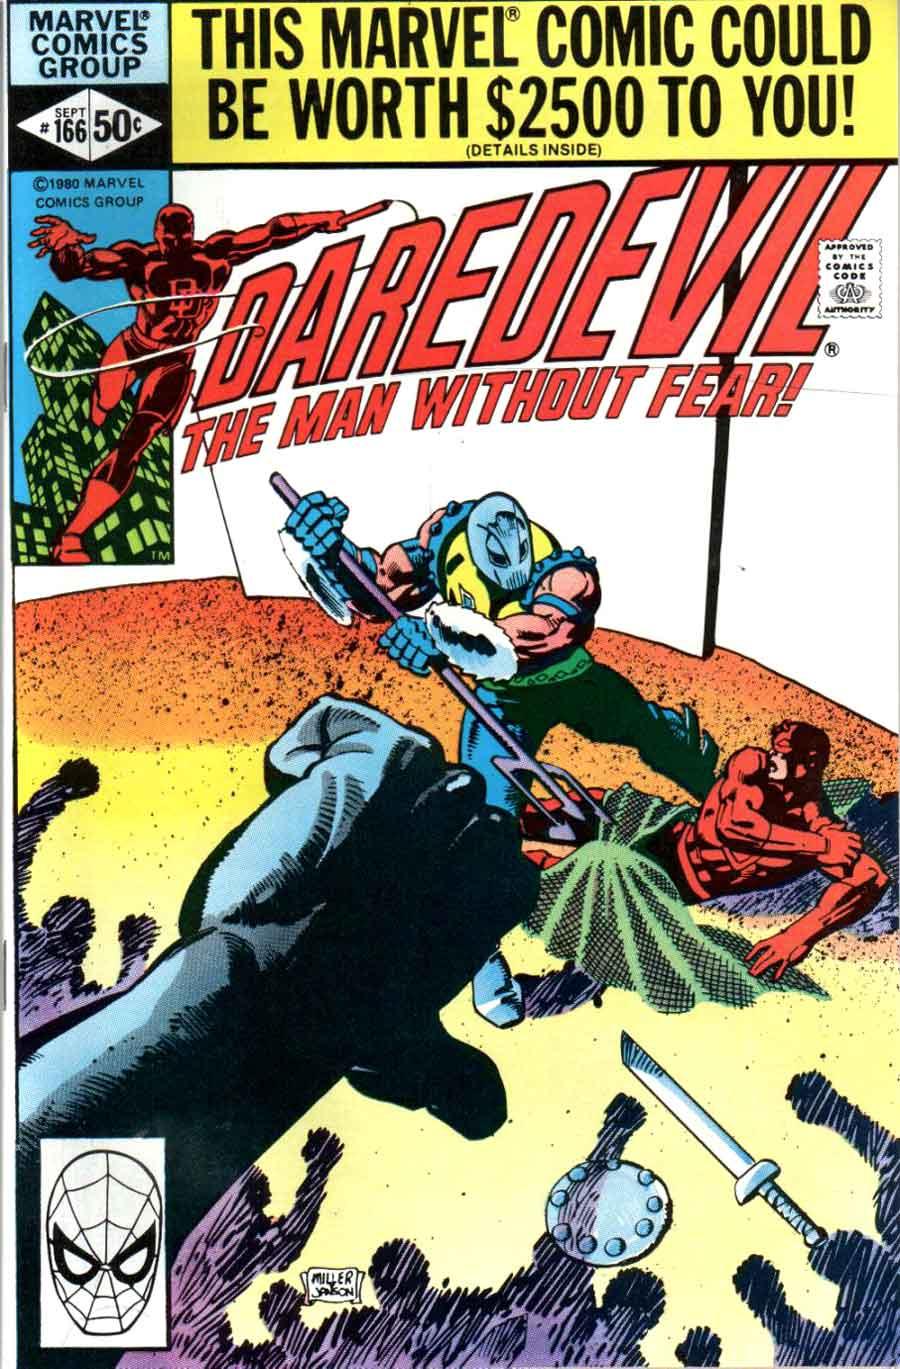 Daredevil v1 #166 marvel comic book cover art by Frank Miller